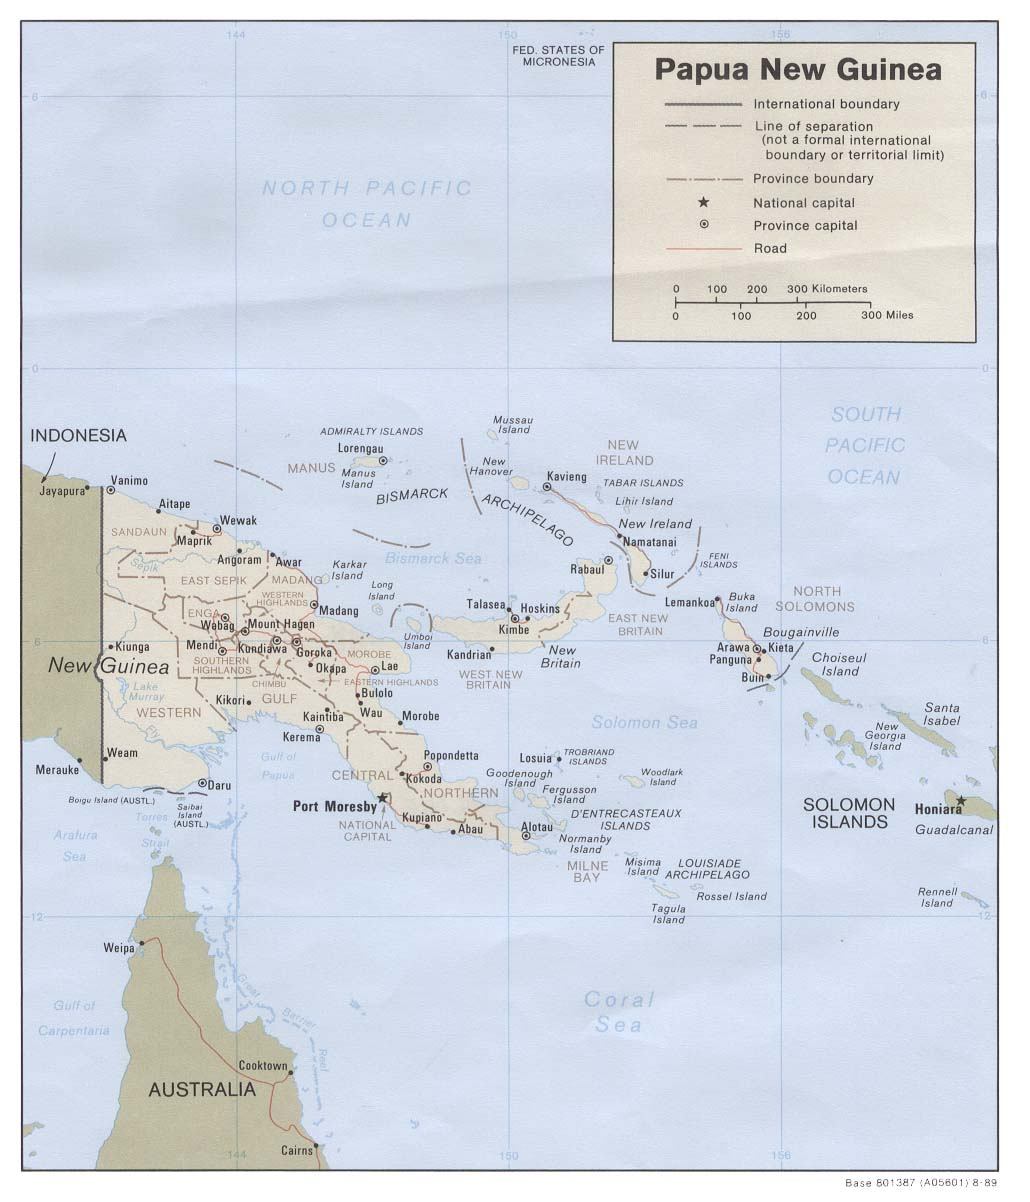 Map Of Papua New Guinea , Papua New Guinea [Political Map] 1989 (131K)